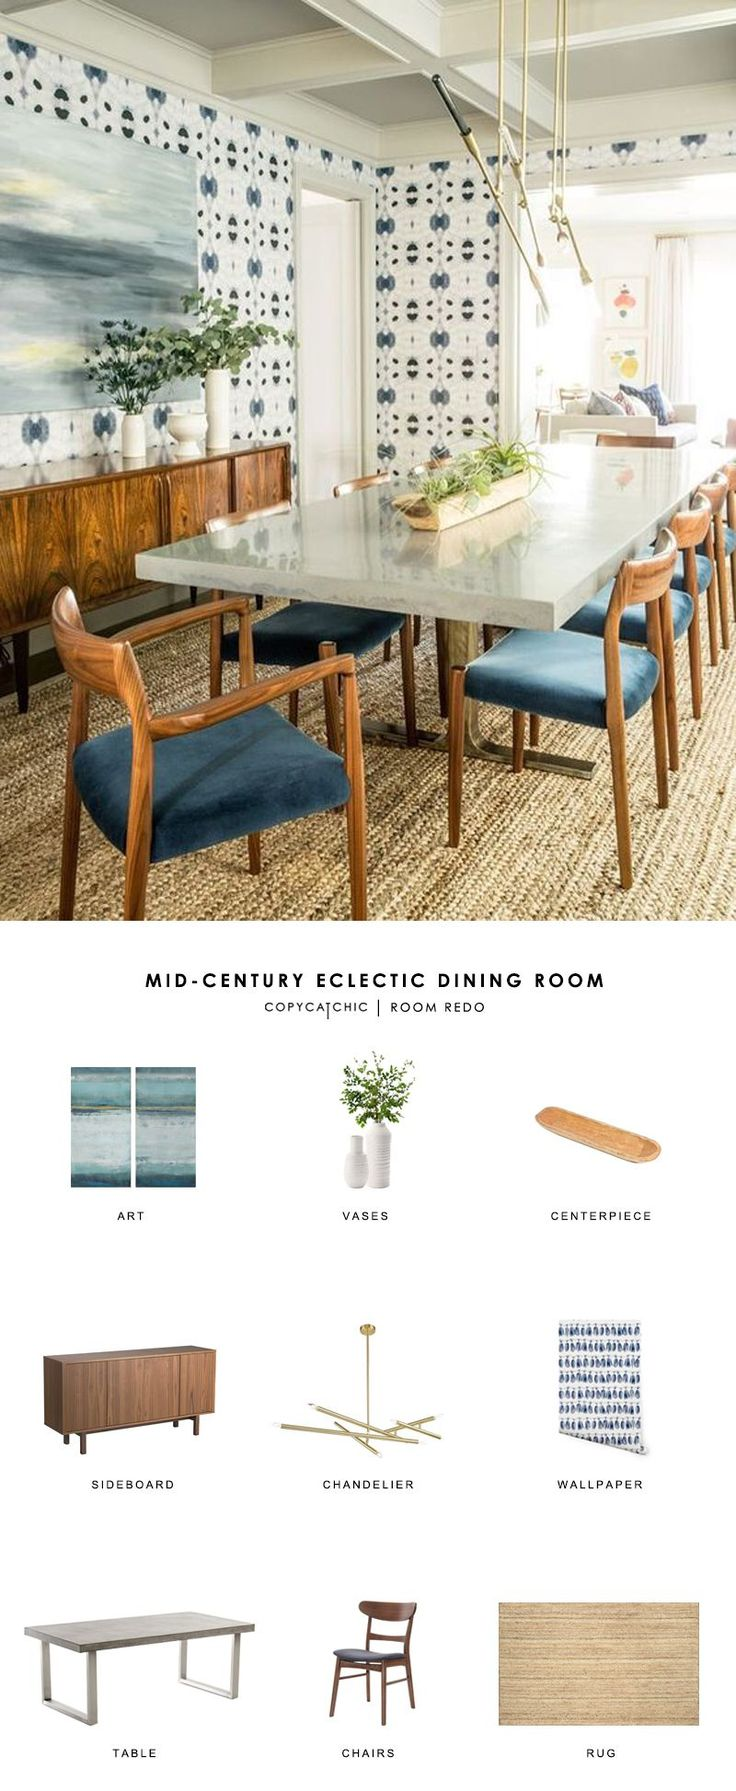 Copy Cat Chic Room Redo | Mid-Century Eclectic Dining Room